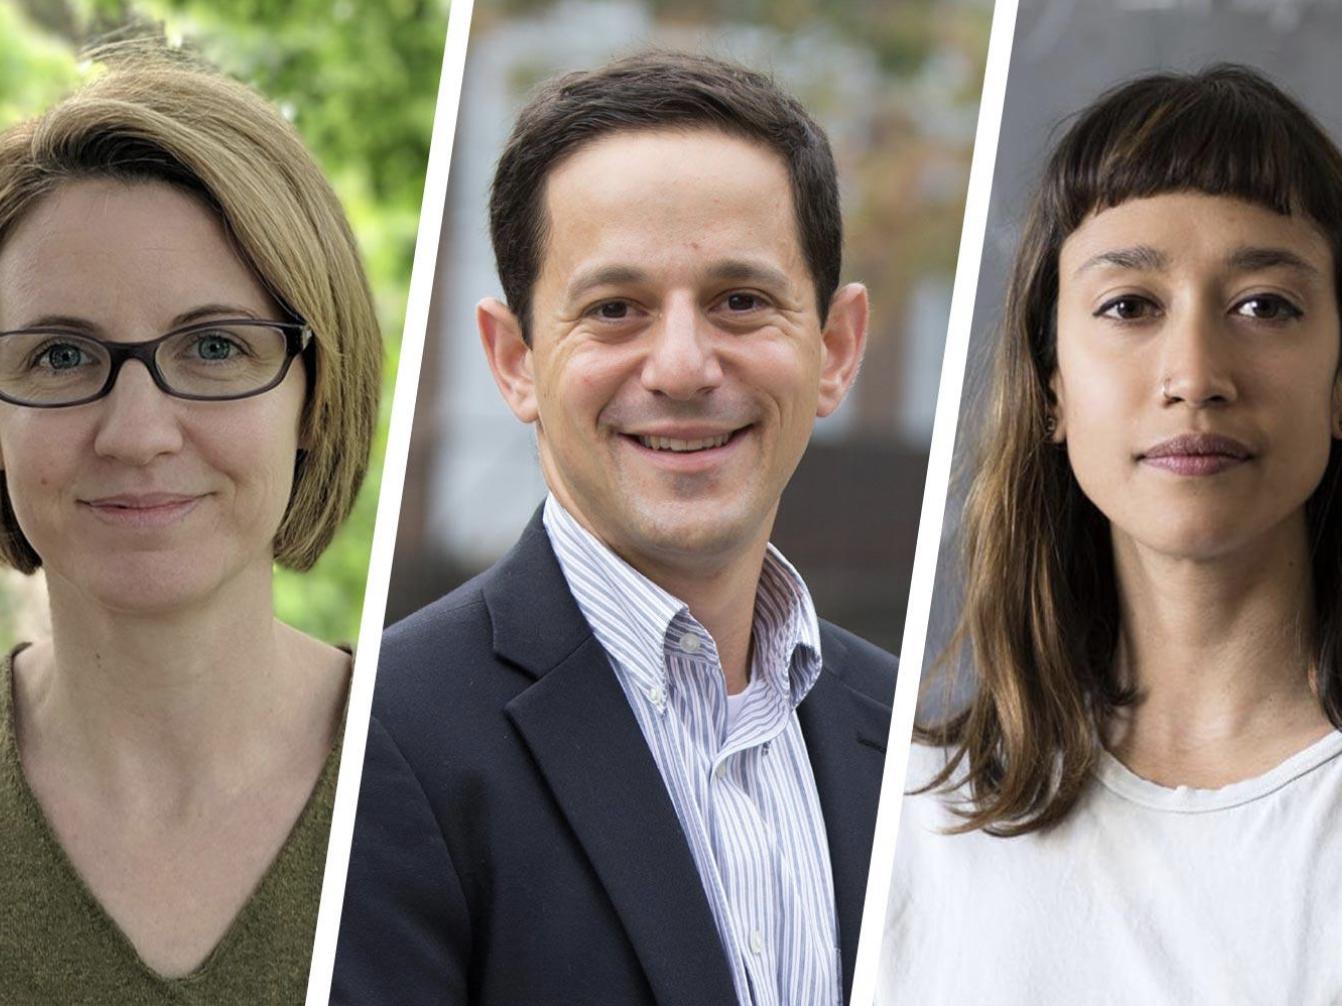 White House Honors UVA Trio for Early Career Accomplishments